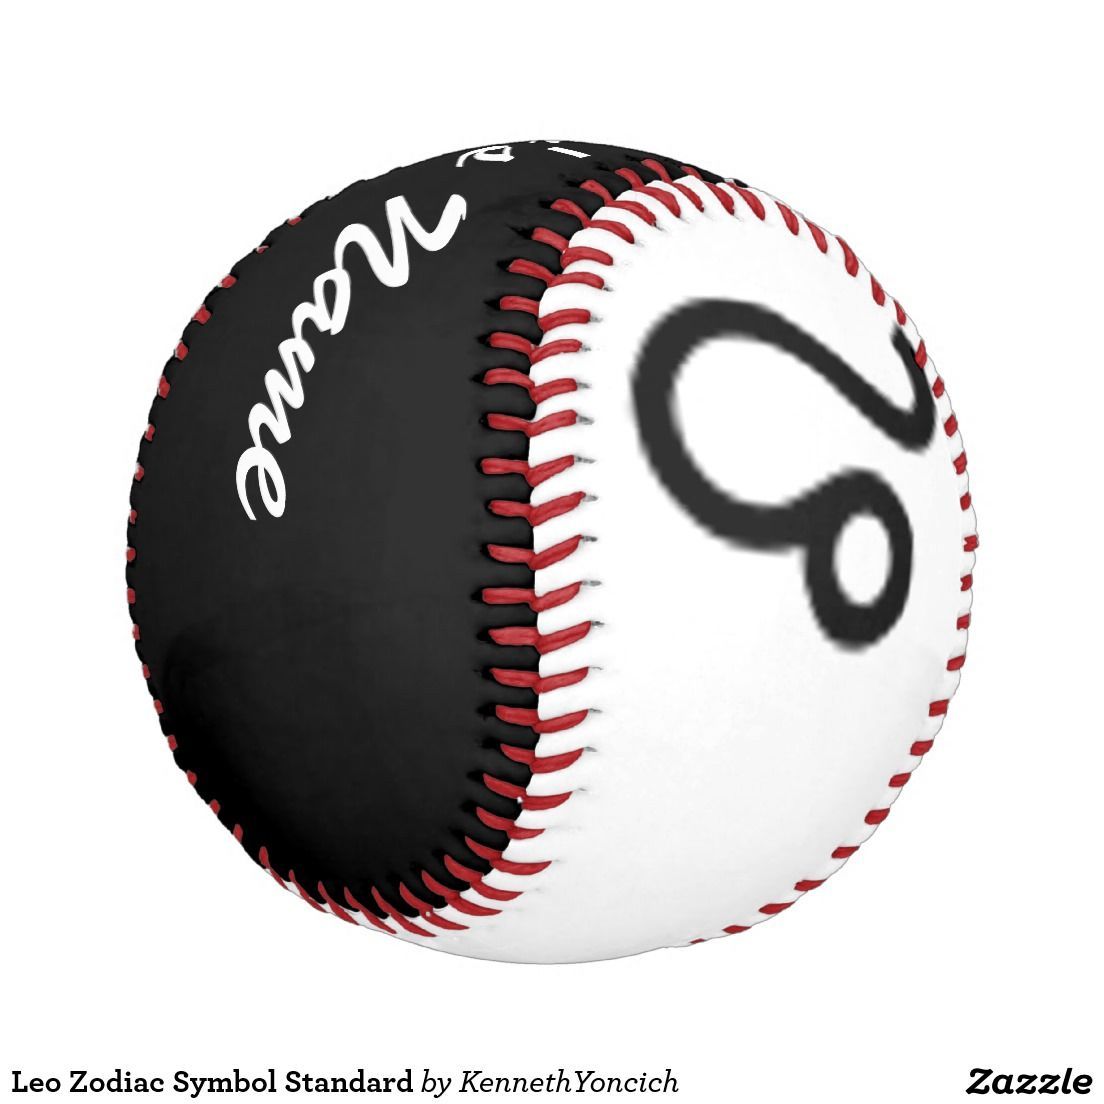 Leo zodiac symbol standard baseball zodiac symbols leo zodiac leo zodiac symbol standard baseball biocorpaavc